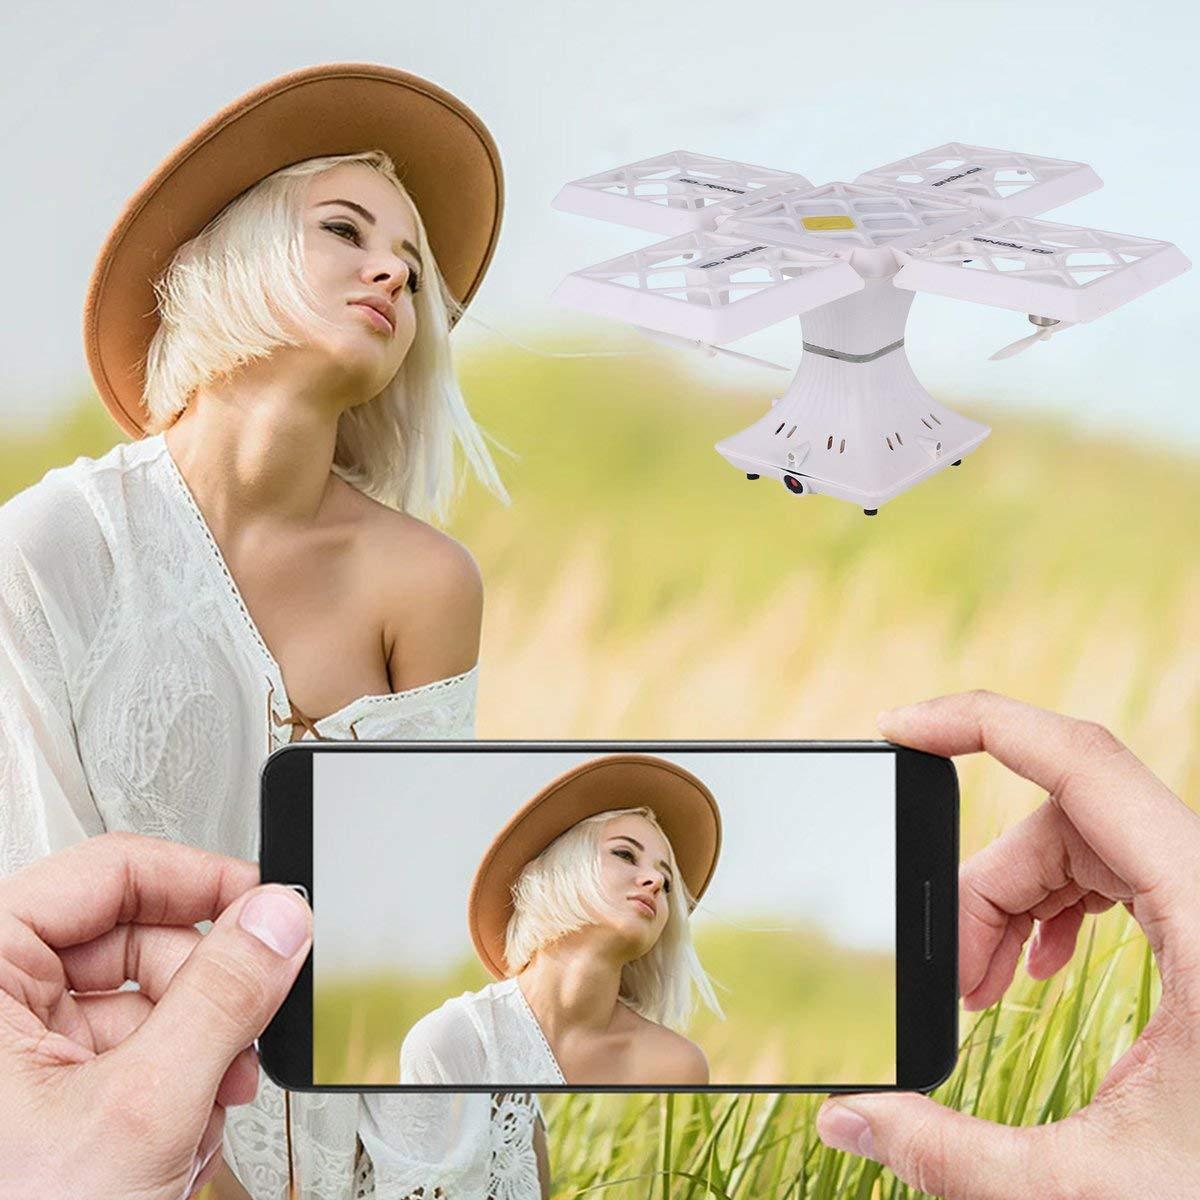 Gugutogo Drohne Mit Kamera 414 Selfie FPV Faltbare Faltbare Faltbare RC Drohne Höhe Halten 0.3MP WiFi Kamera 3D Flips (Schwarz) 8f595b